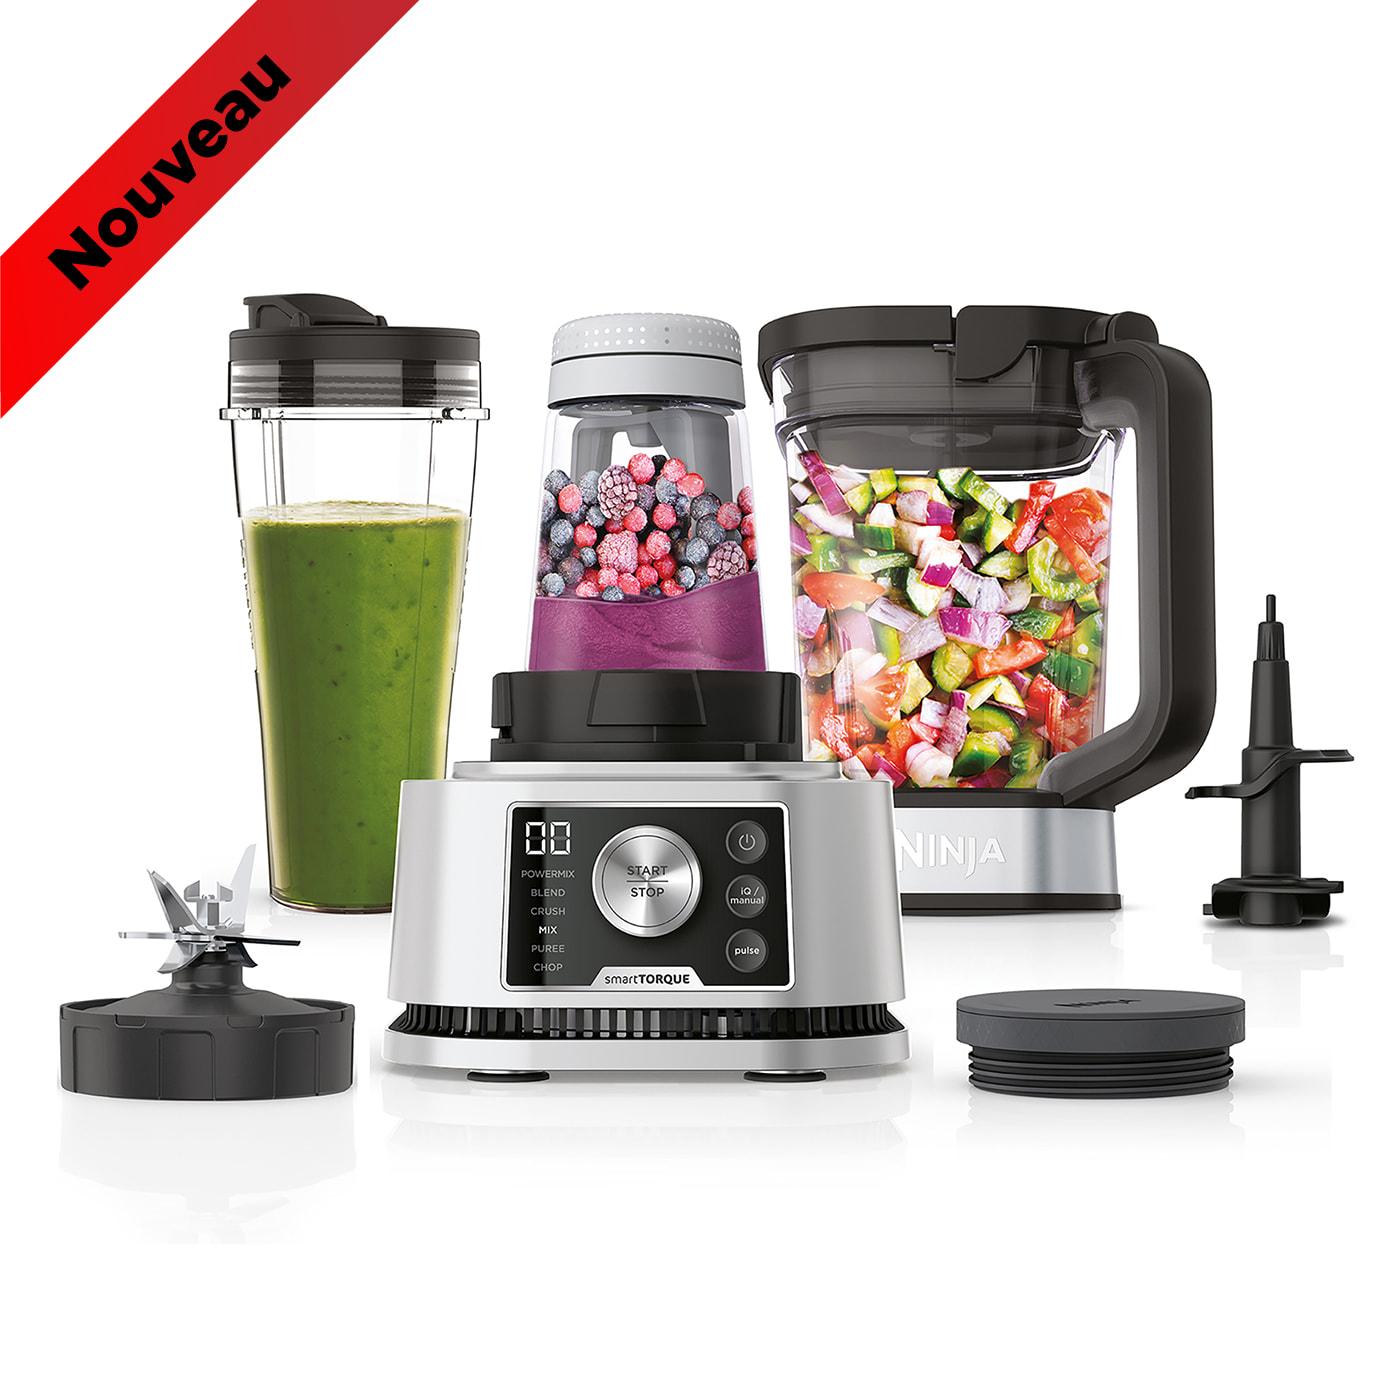 Blender 3 en 1 Ninja Foodi Power Nutri avec technologies Smart Torque & Auto-iQ 1200W - CB350EU photo du produit